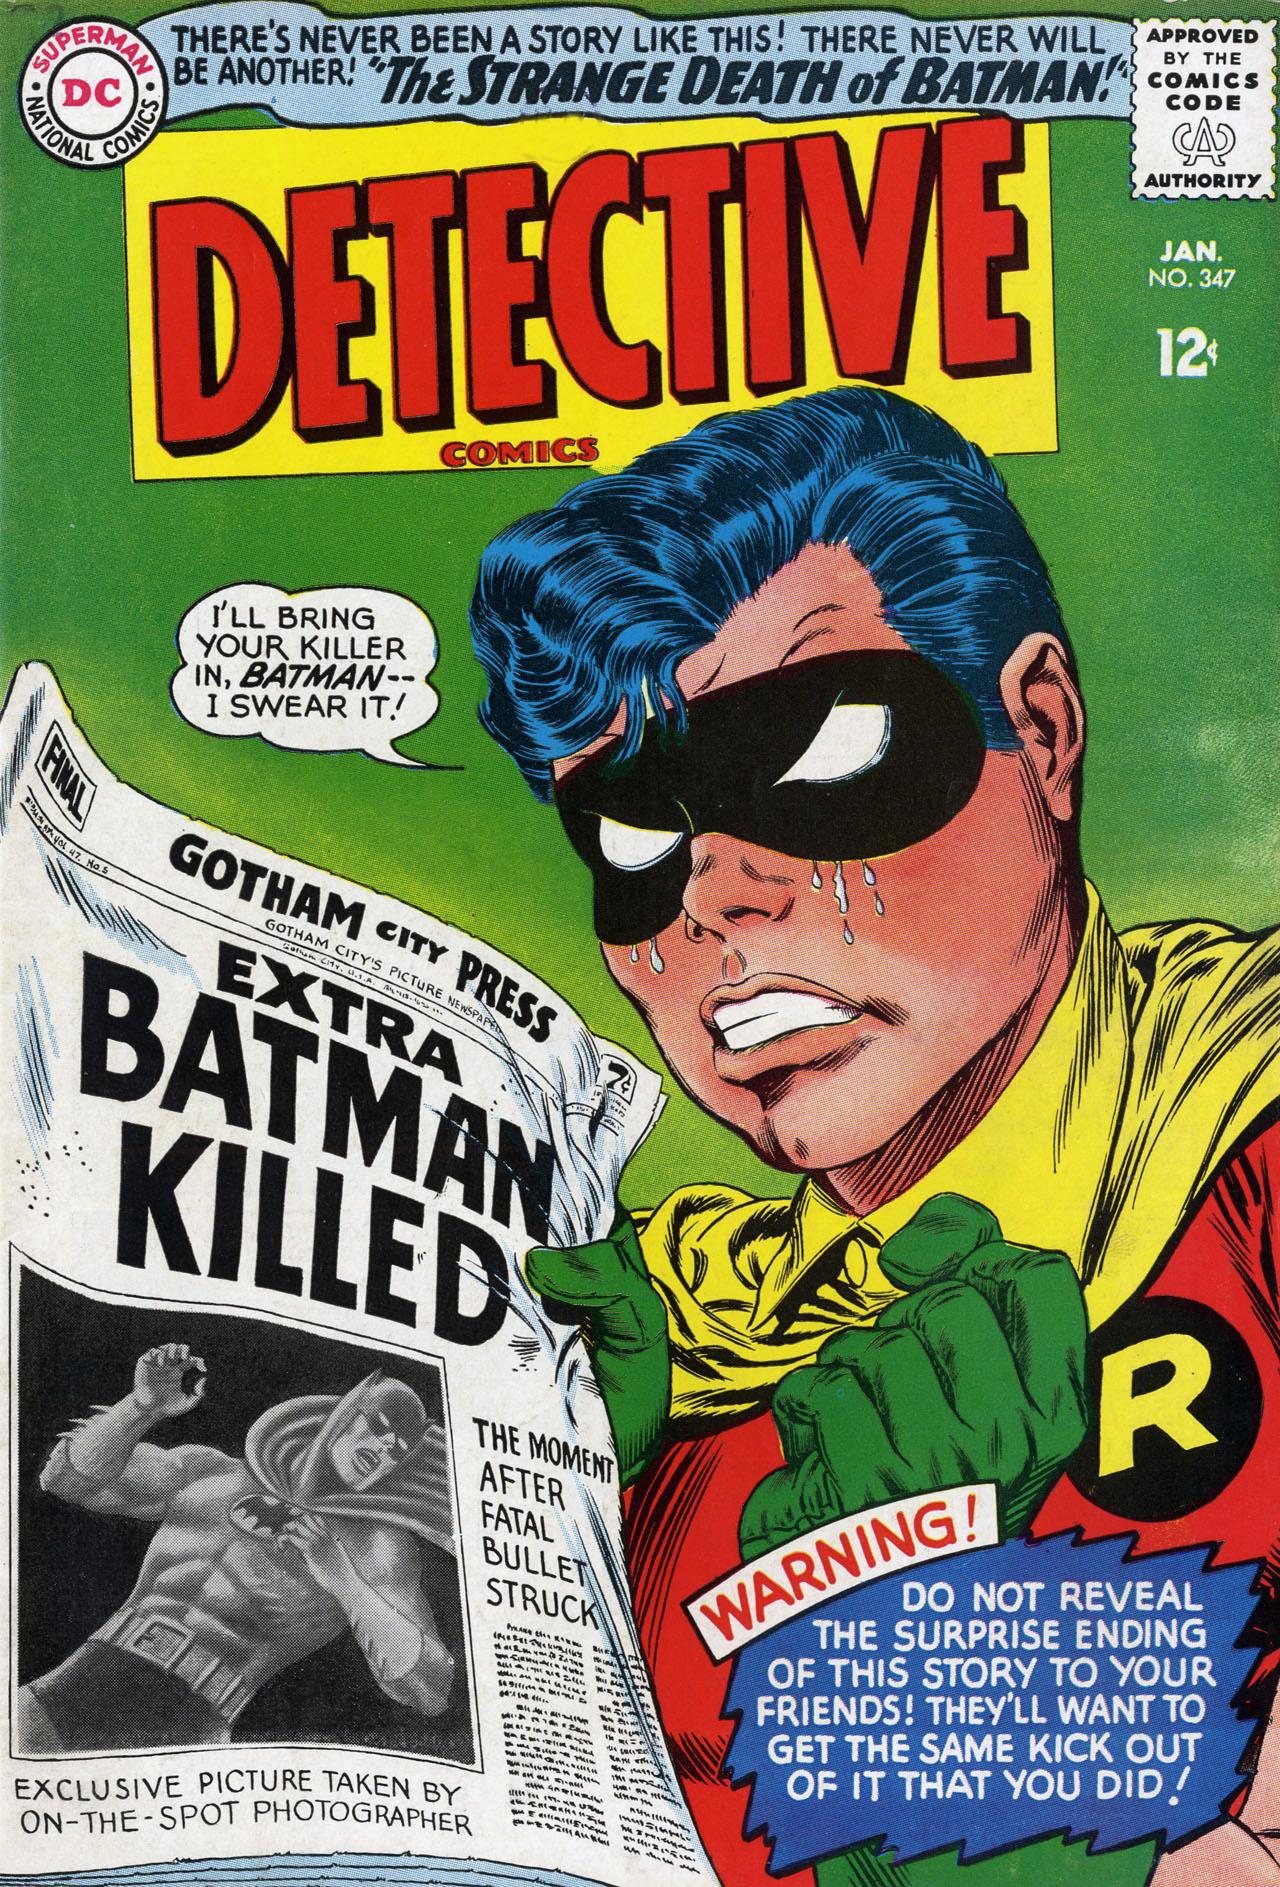 Batman Issue 1 Pdf